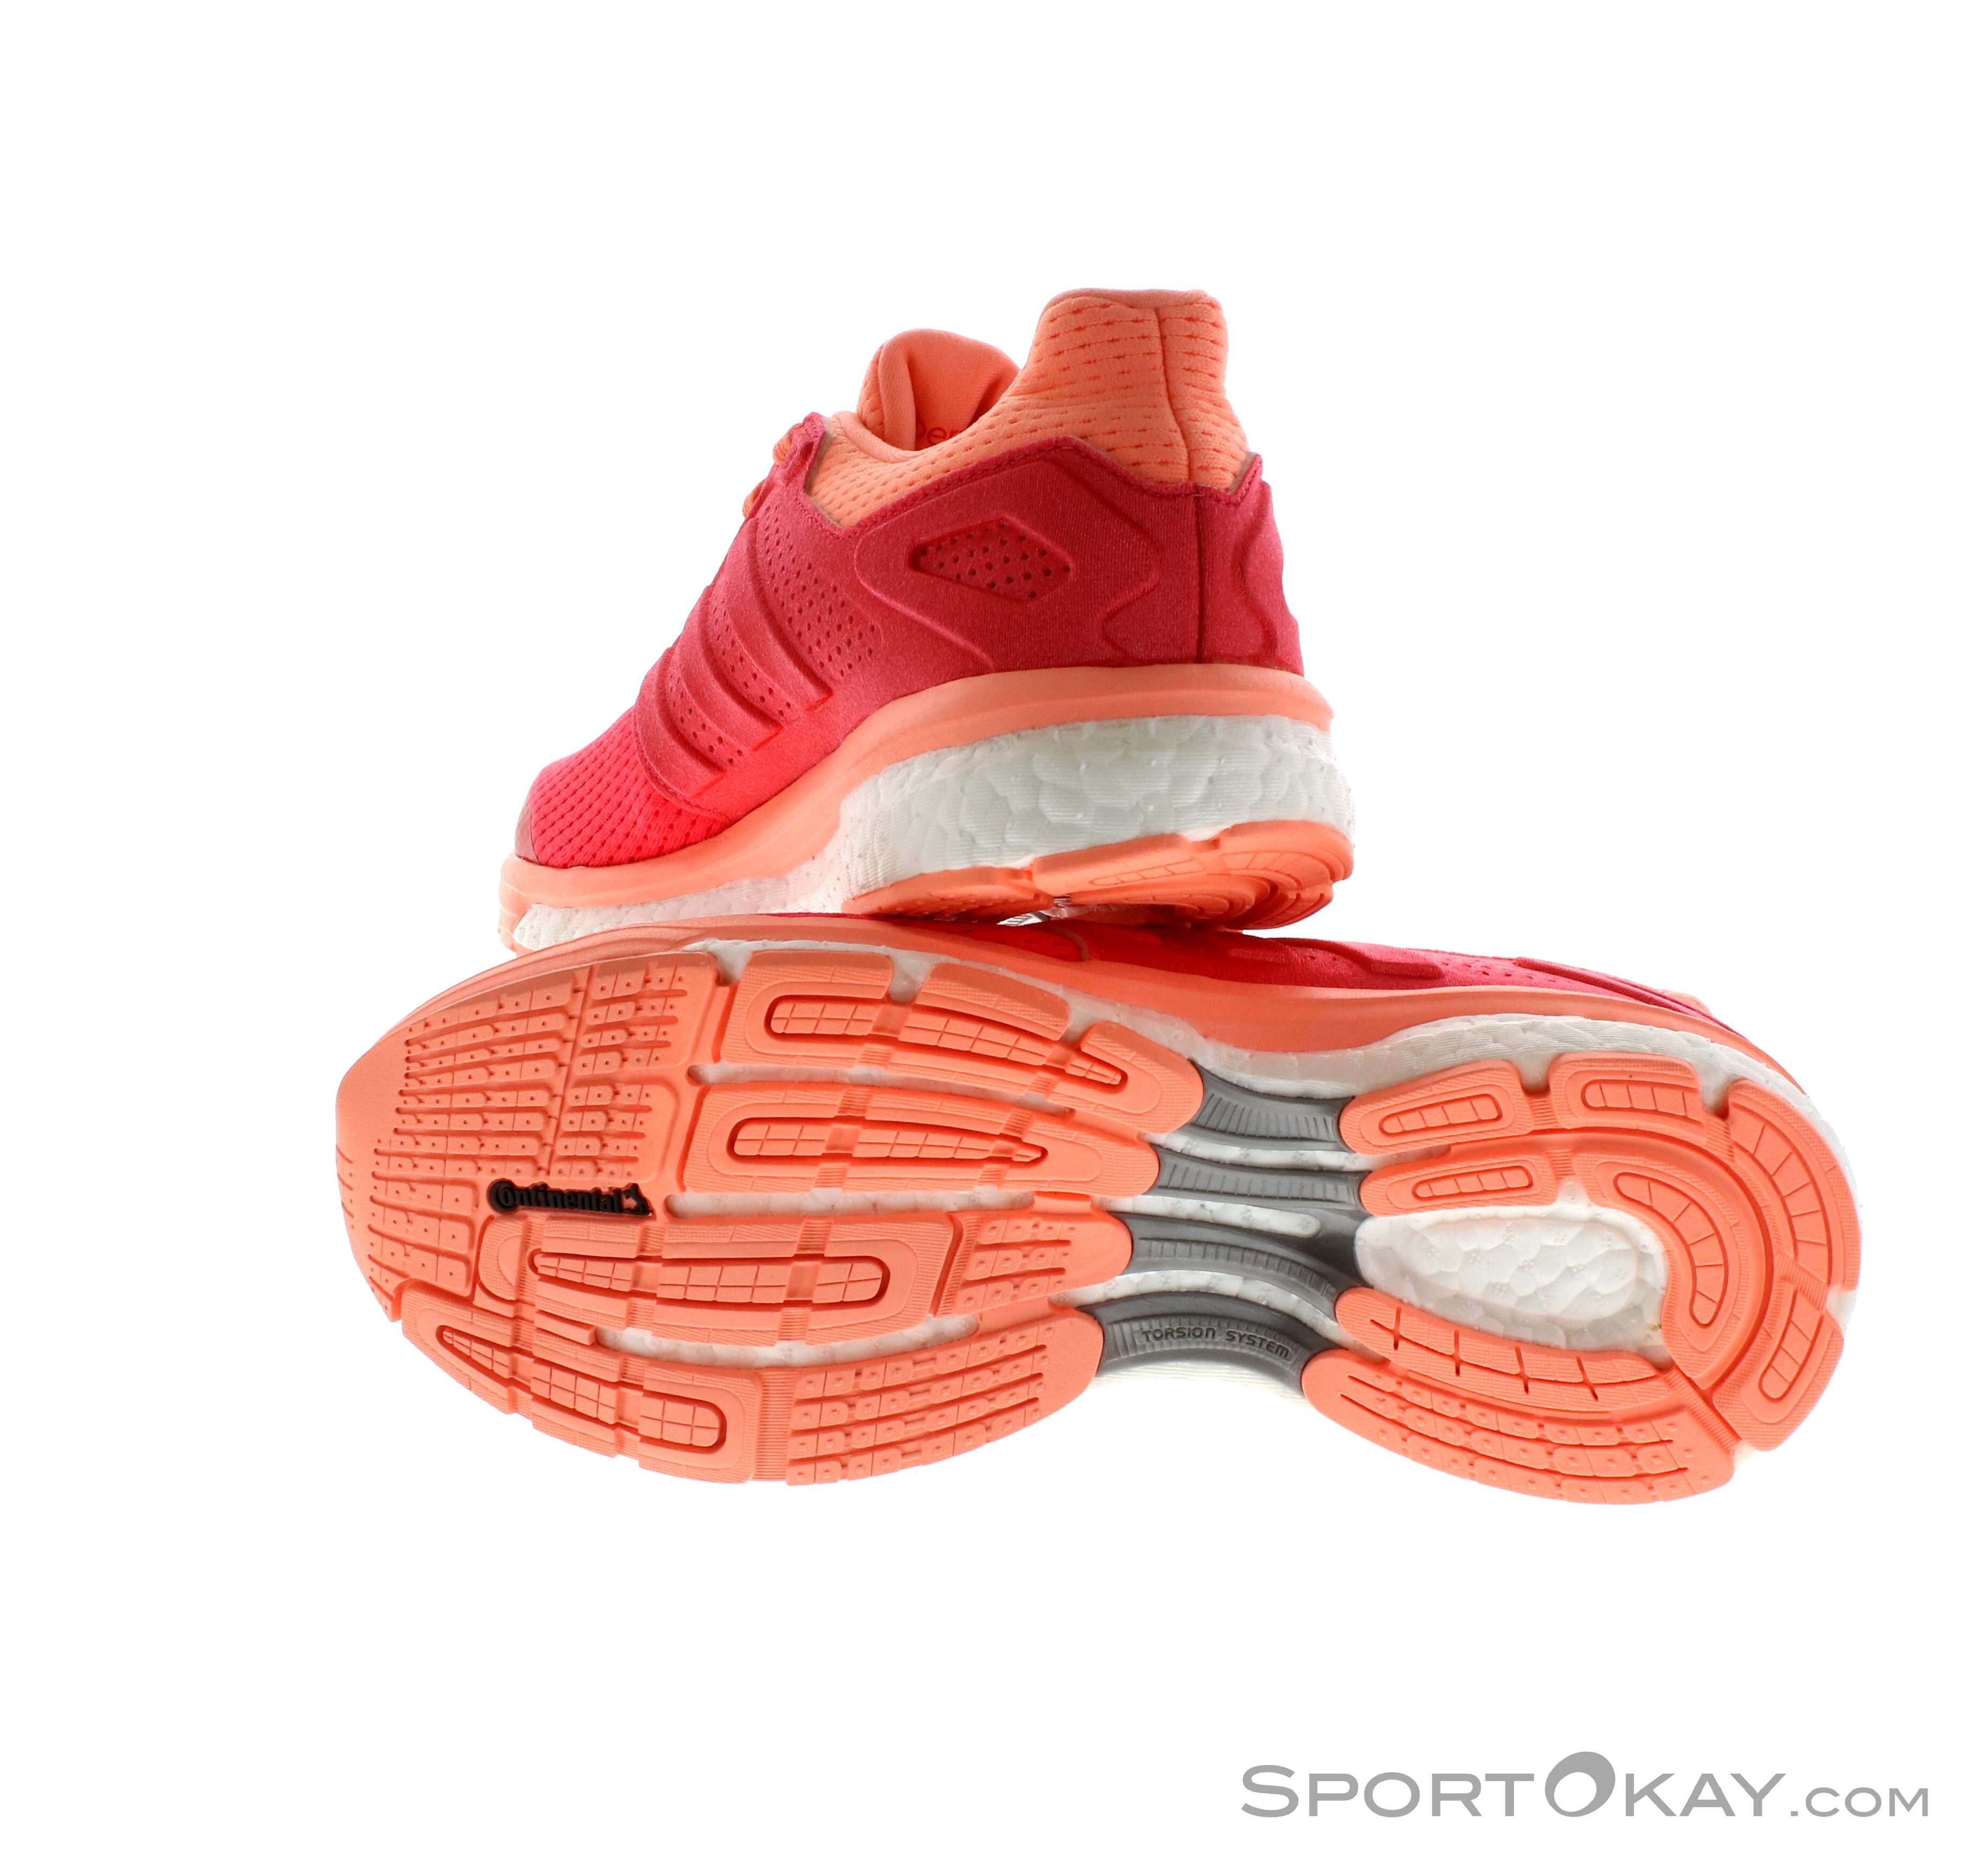 d88ec48e3 adidas Supernova Glide Boost 8 Womens Running Shoes - All-Round ...